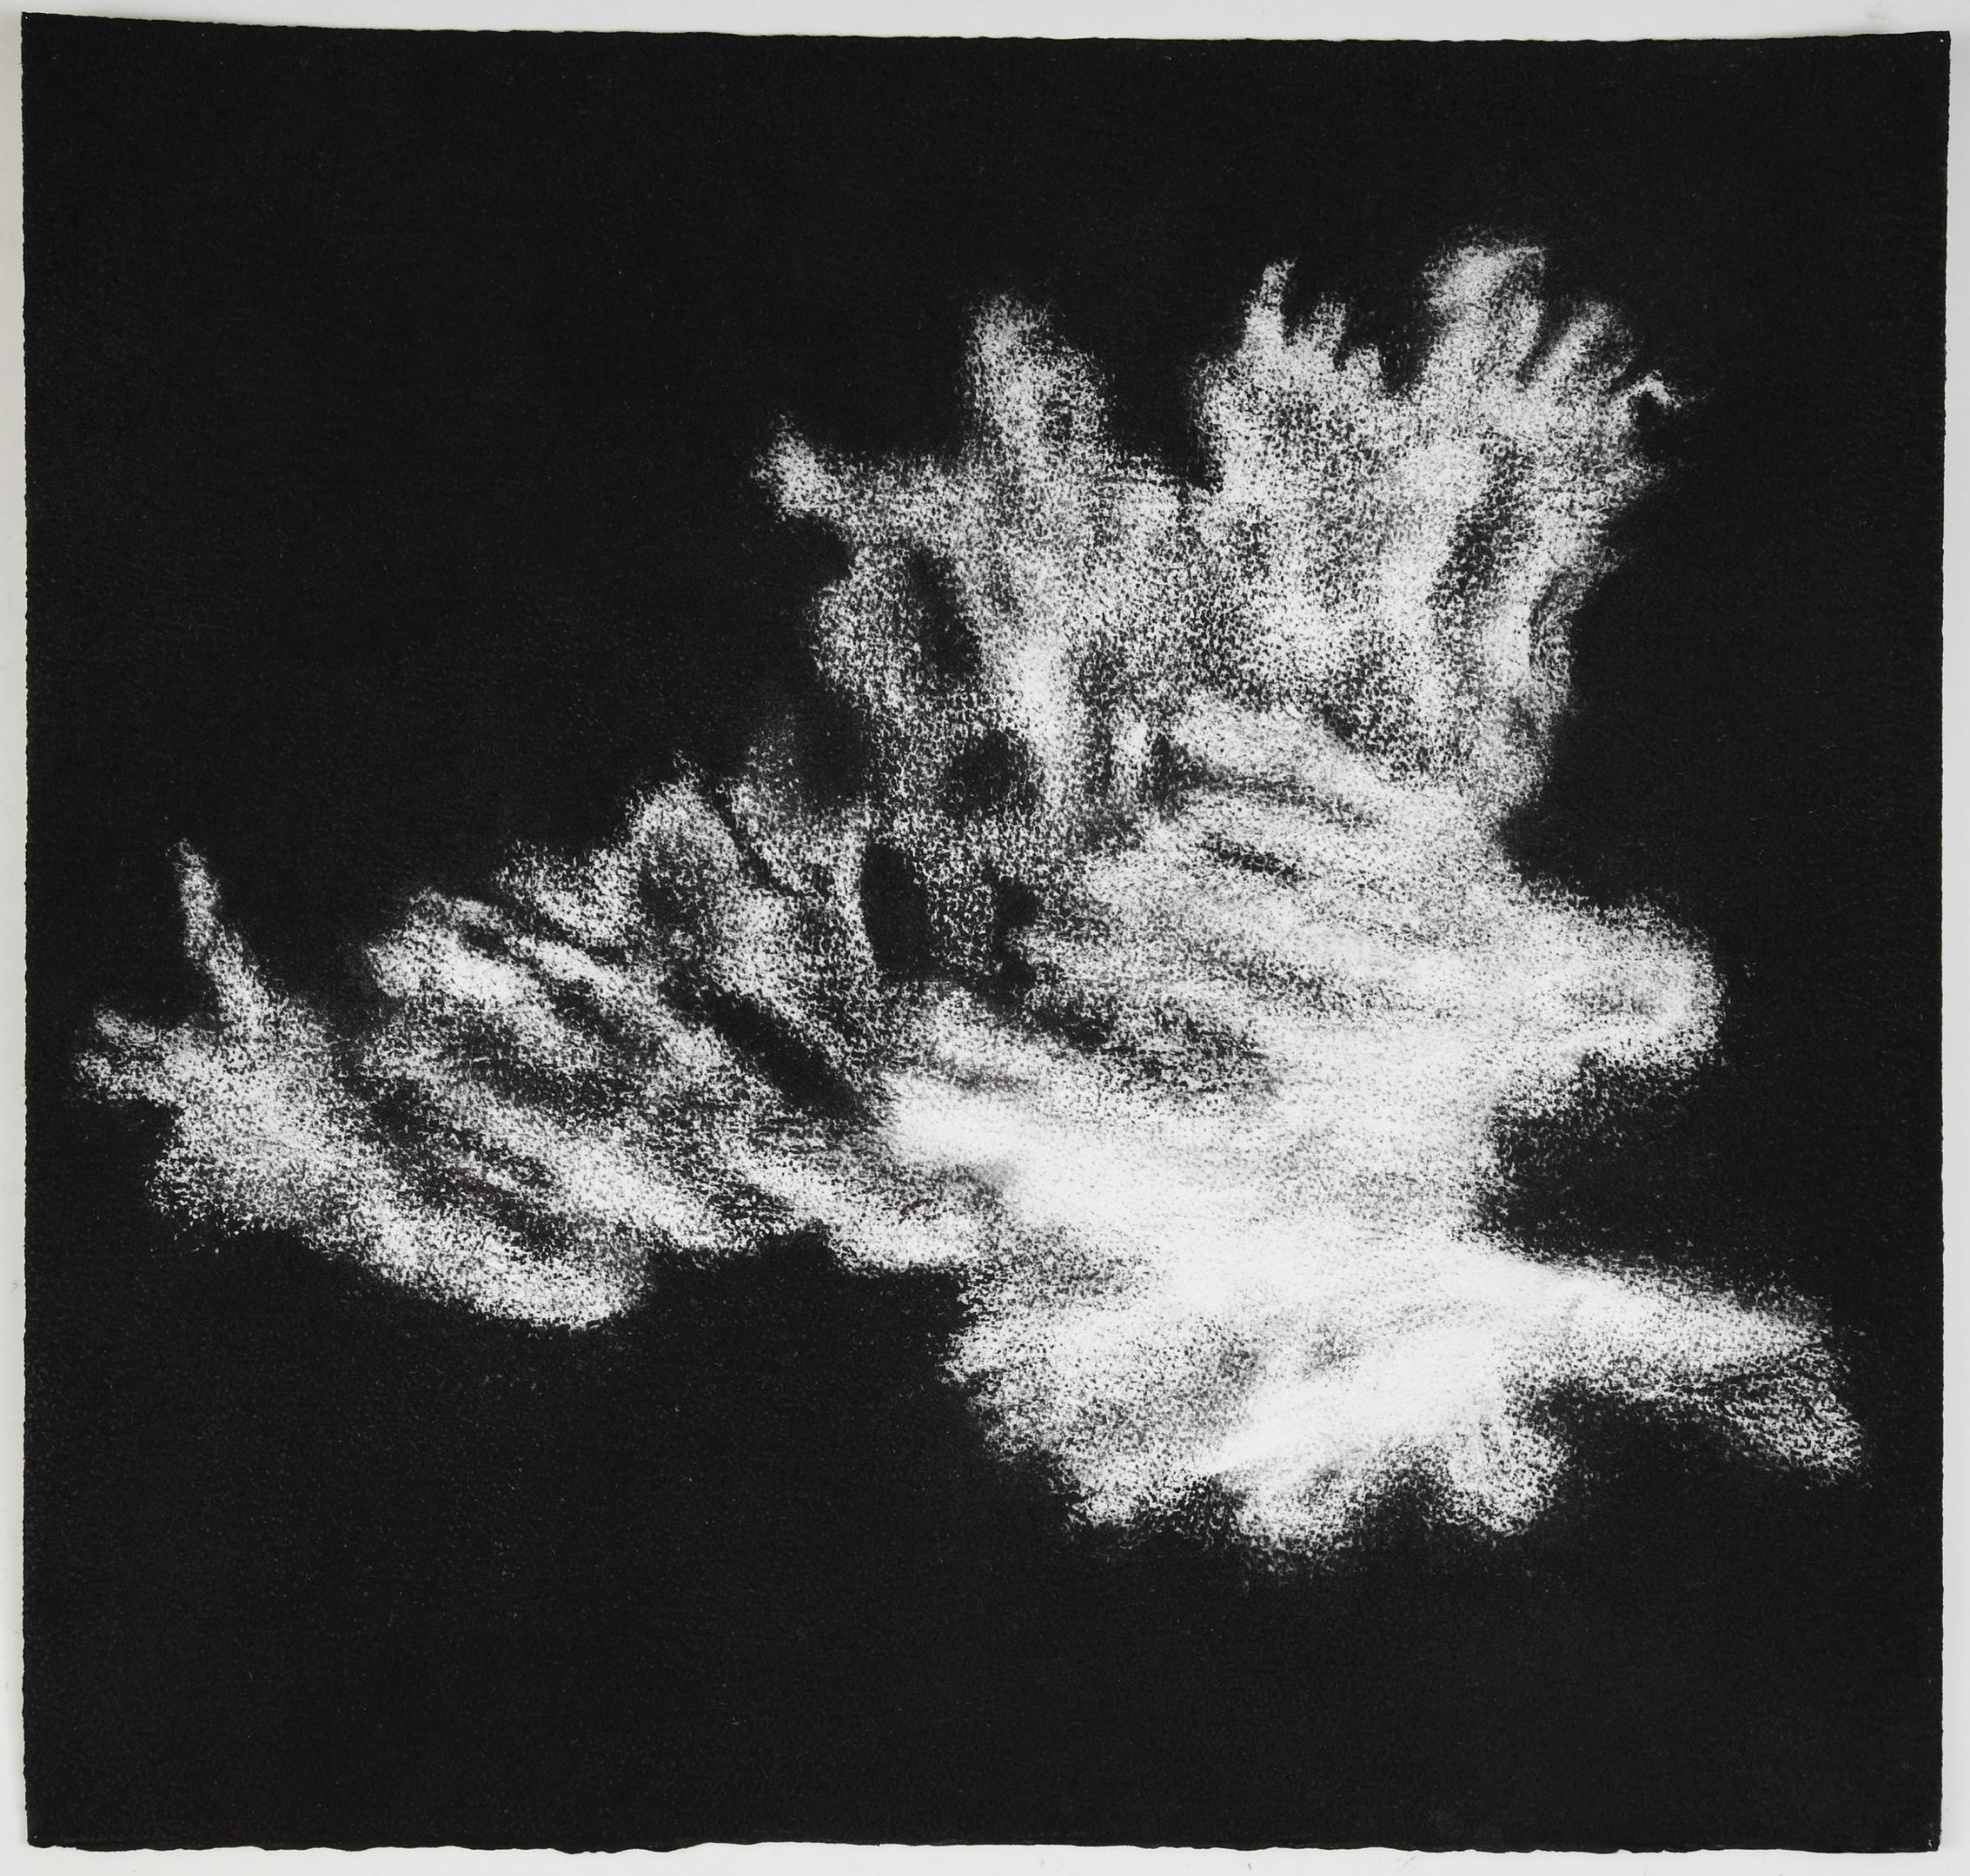 Jennifer Keeler-Milne, 2012, Sea sponge #7, 57x60cm charcoal on paper.jpg